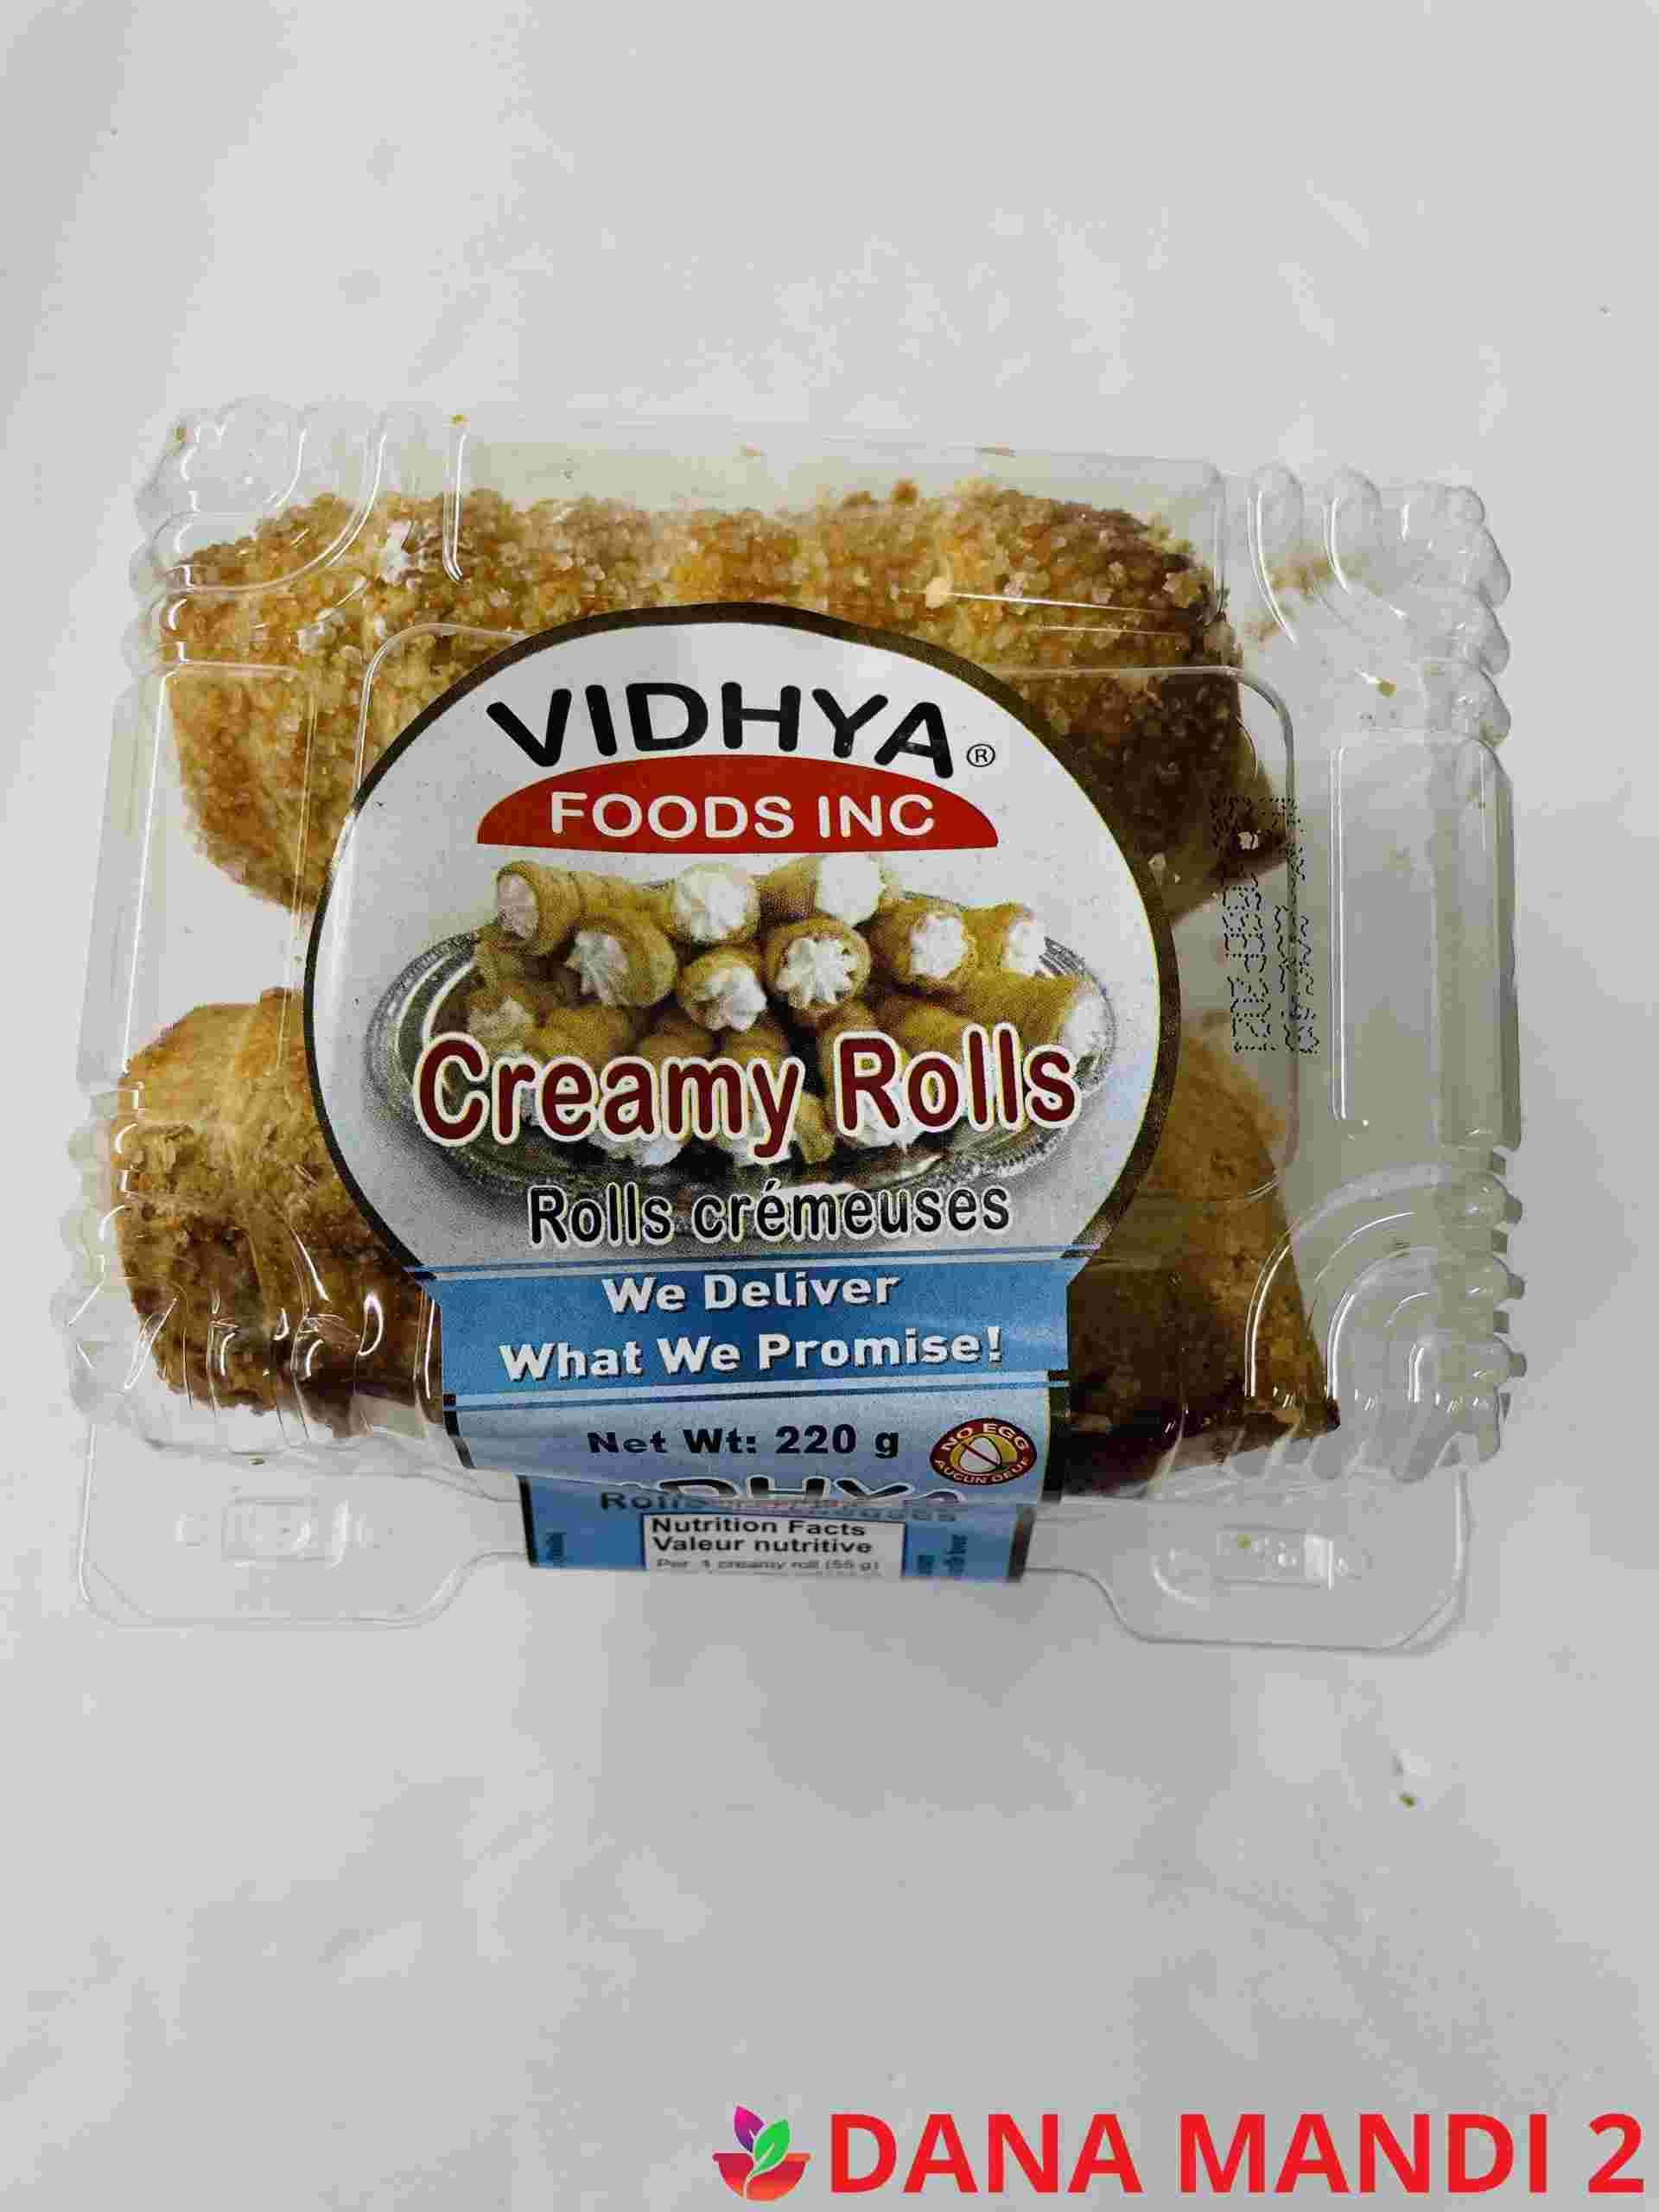 VIDHYA Creamy Rolls